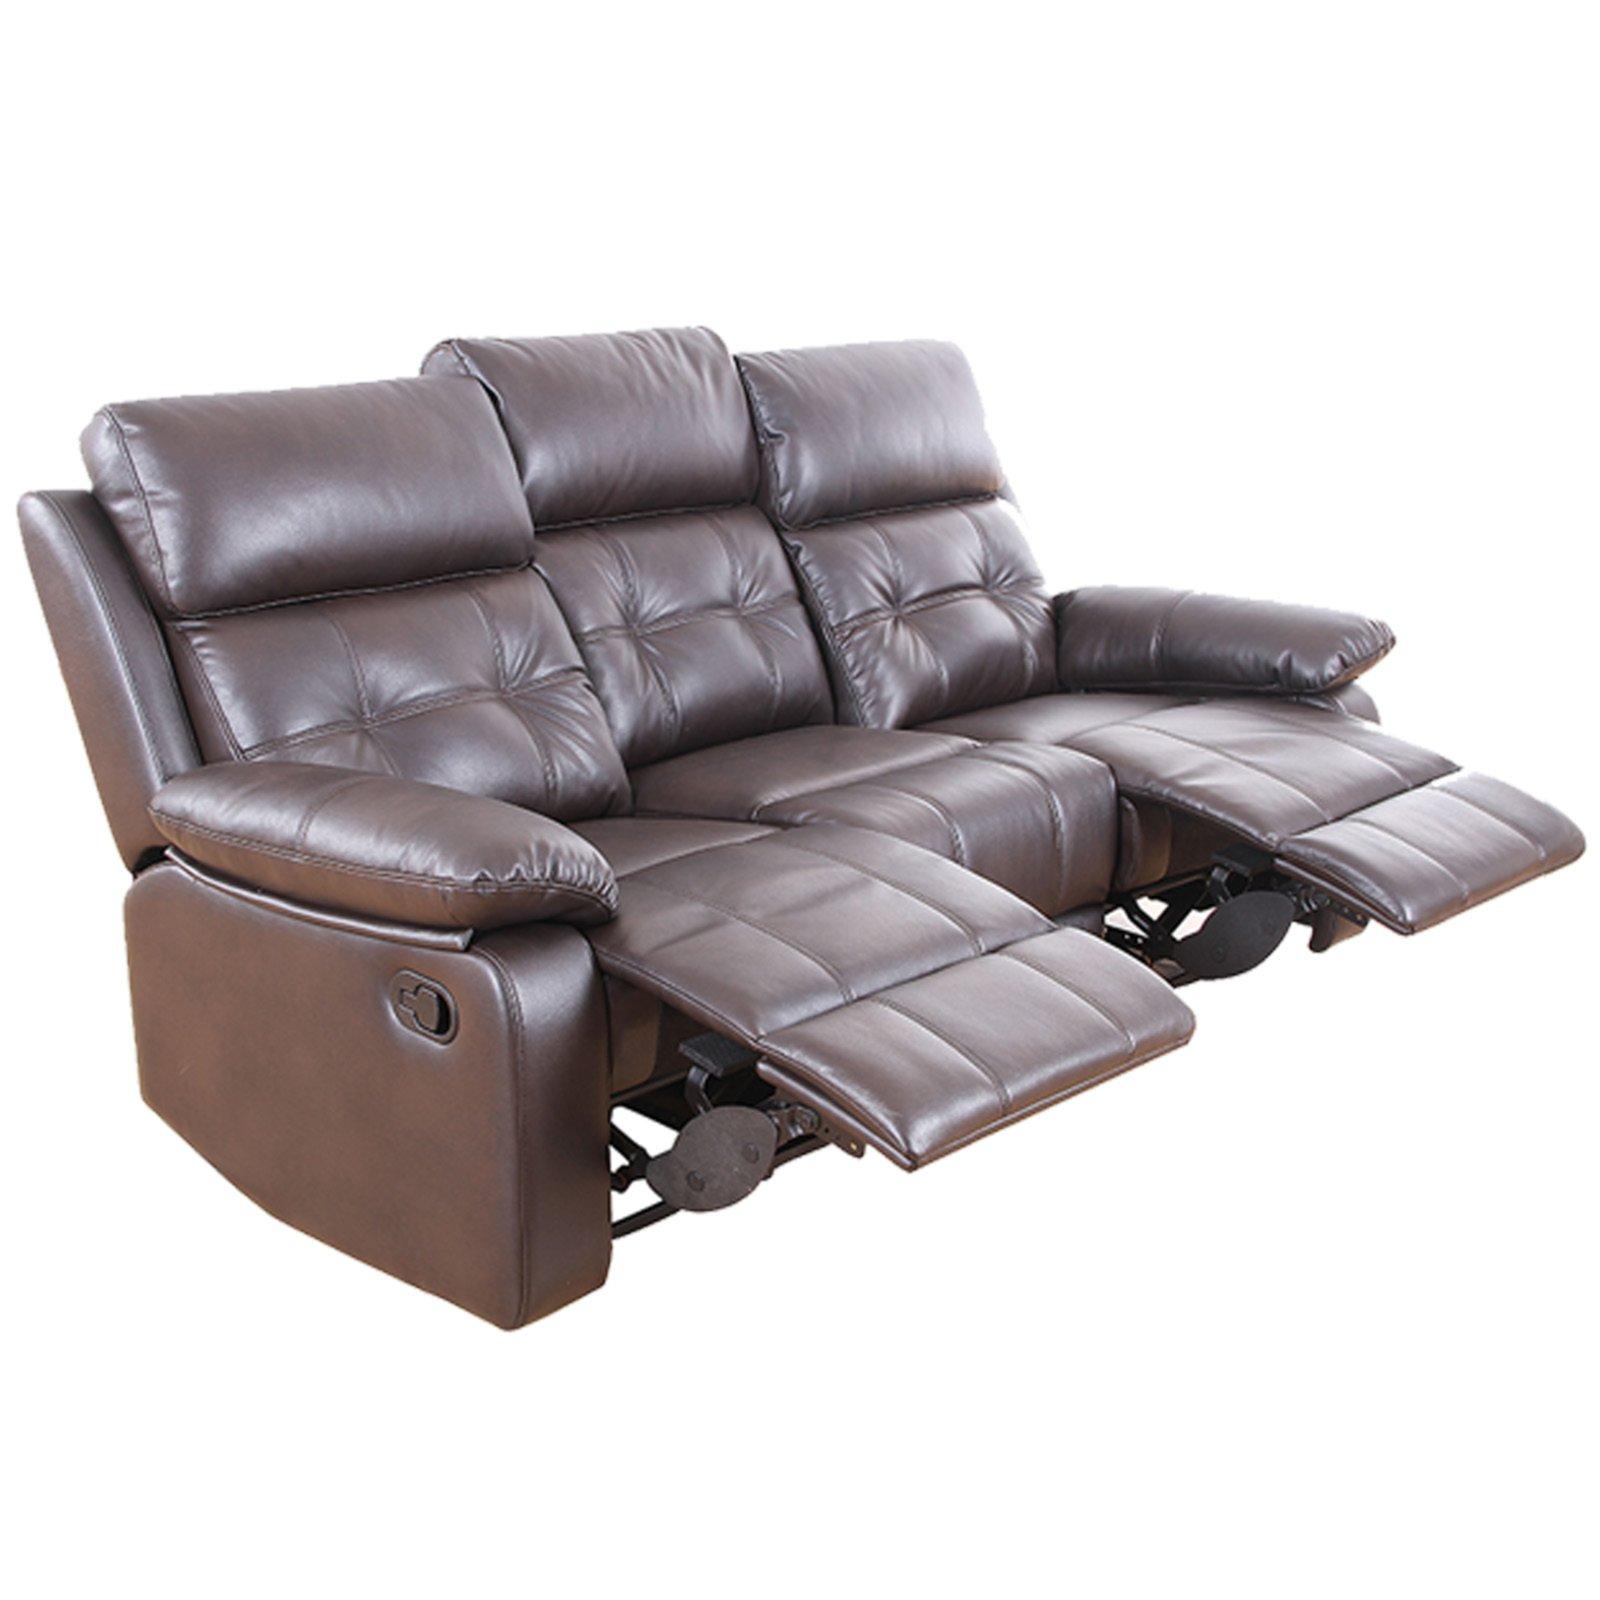 best roller de wohnzimmer polstermoebel ideas. Black Bedroom Furniture Sets. Home Design Ideas